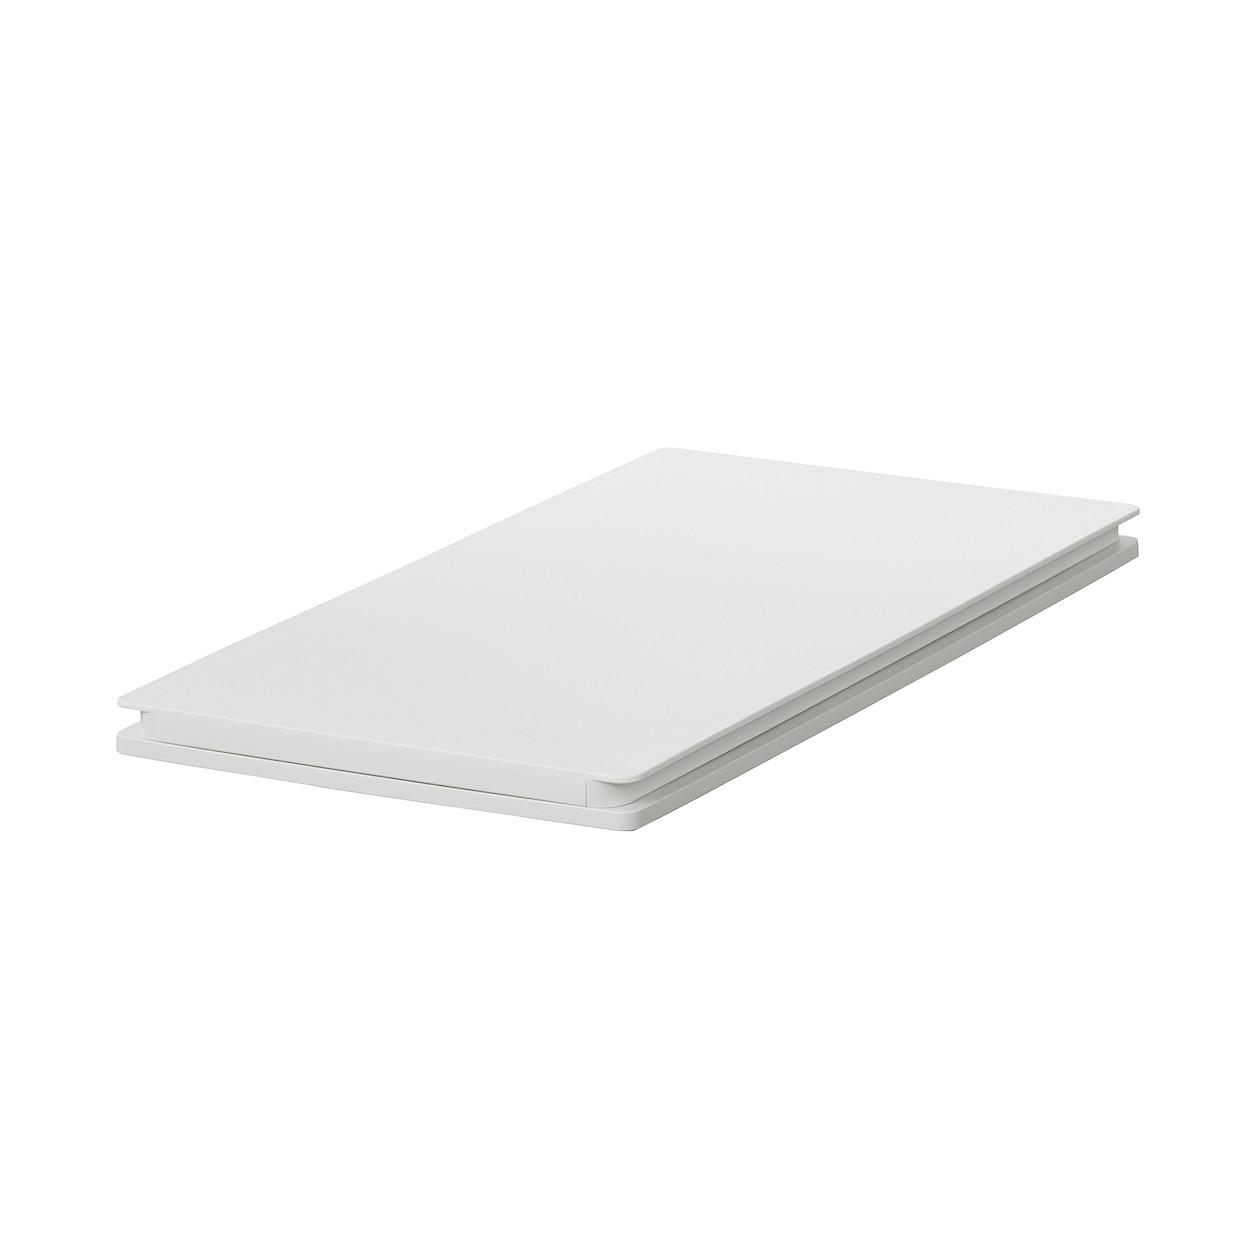 RoomClip商品情報 - ポリプロピレンフタが選べるダストボックス用フタ・横開き用